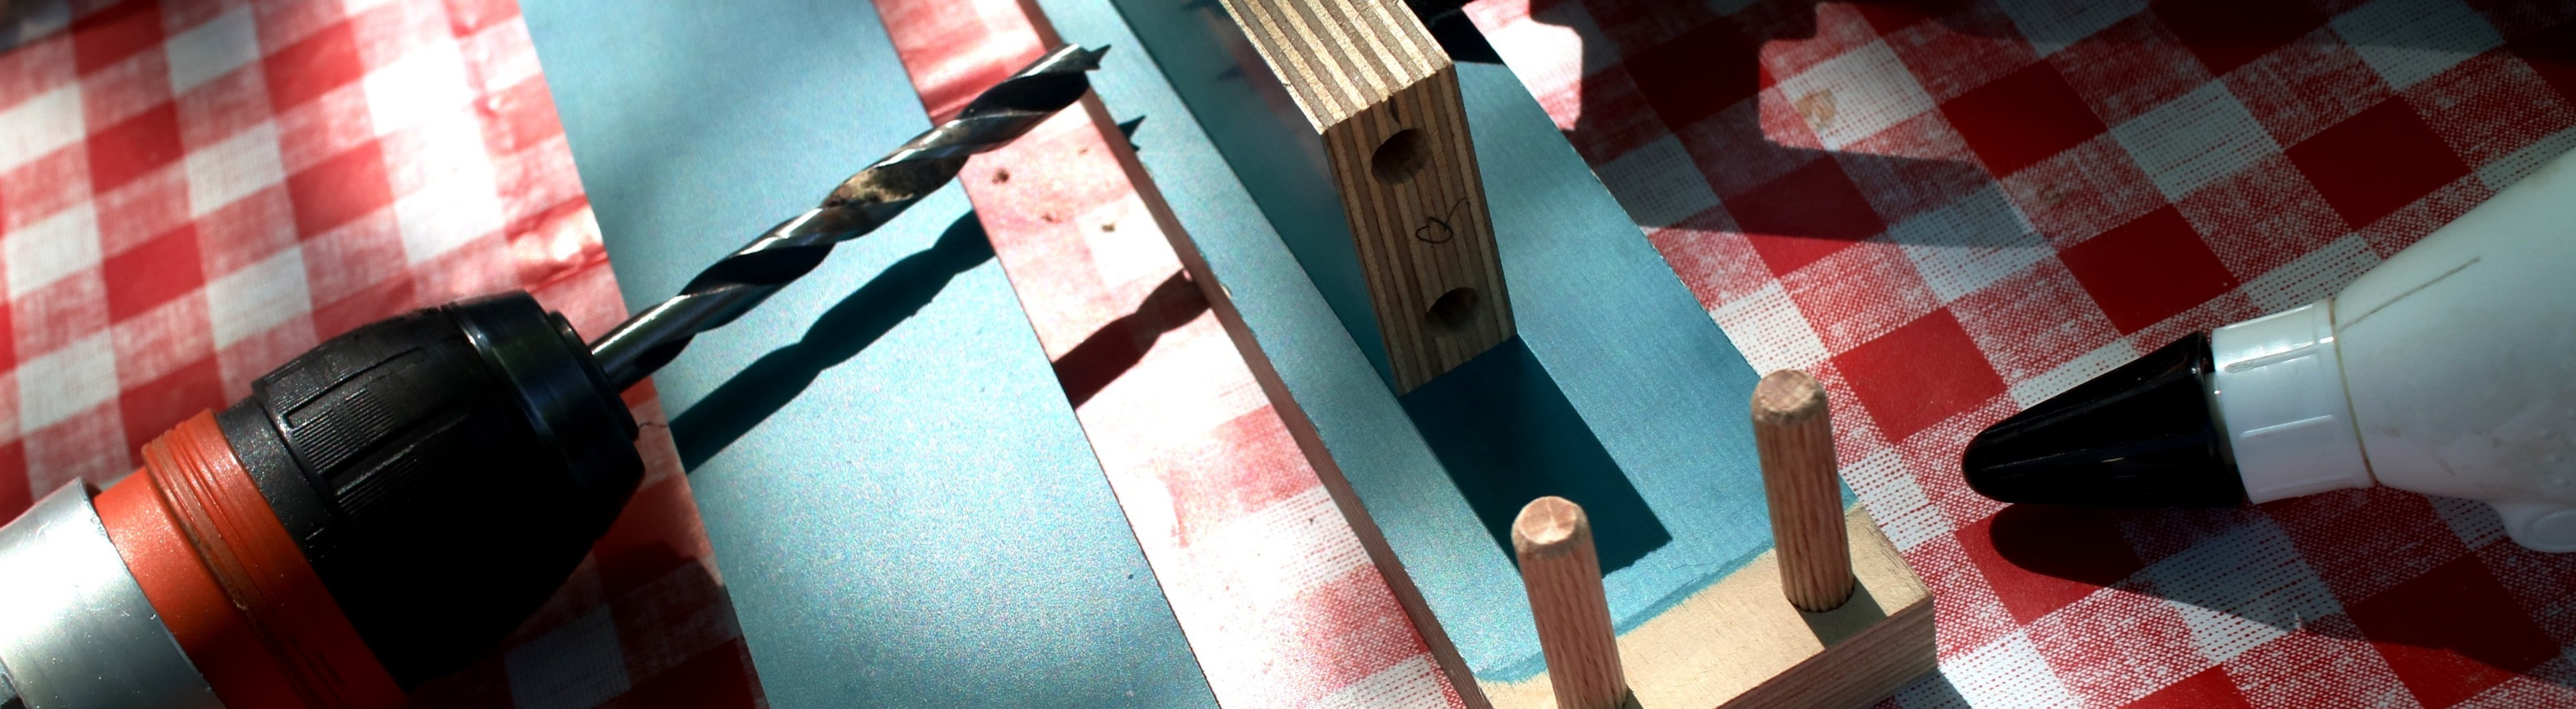 Bohrmaschine, Holzkleber und Multiplexplatten-Bastelprojekt